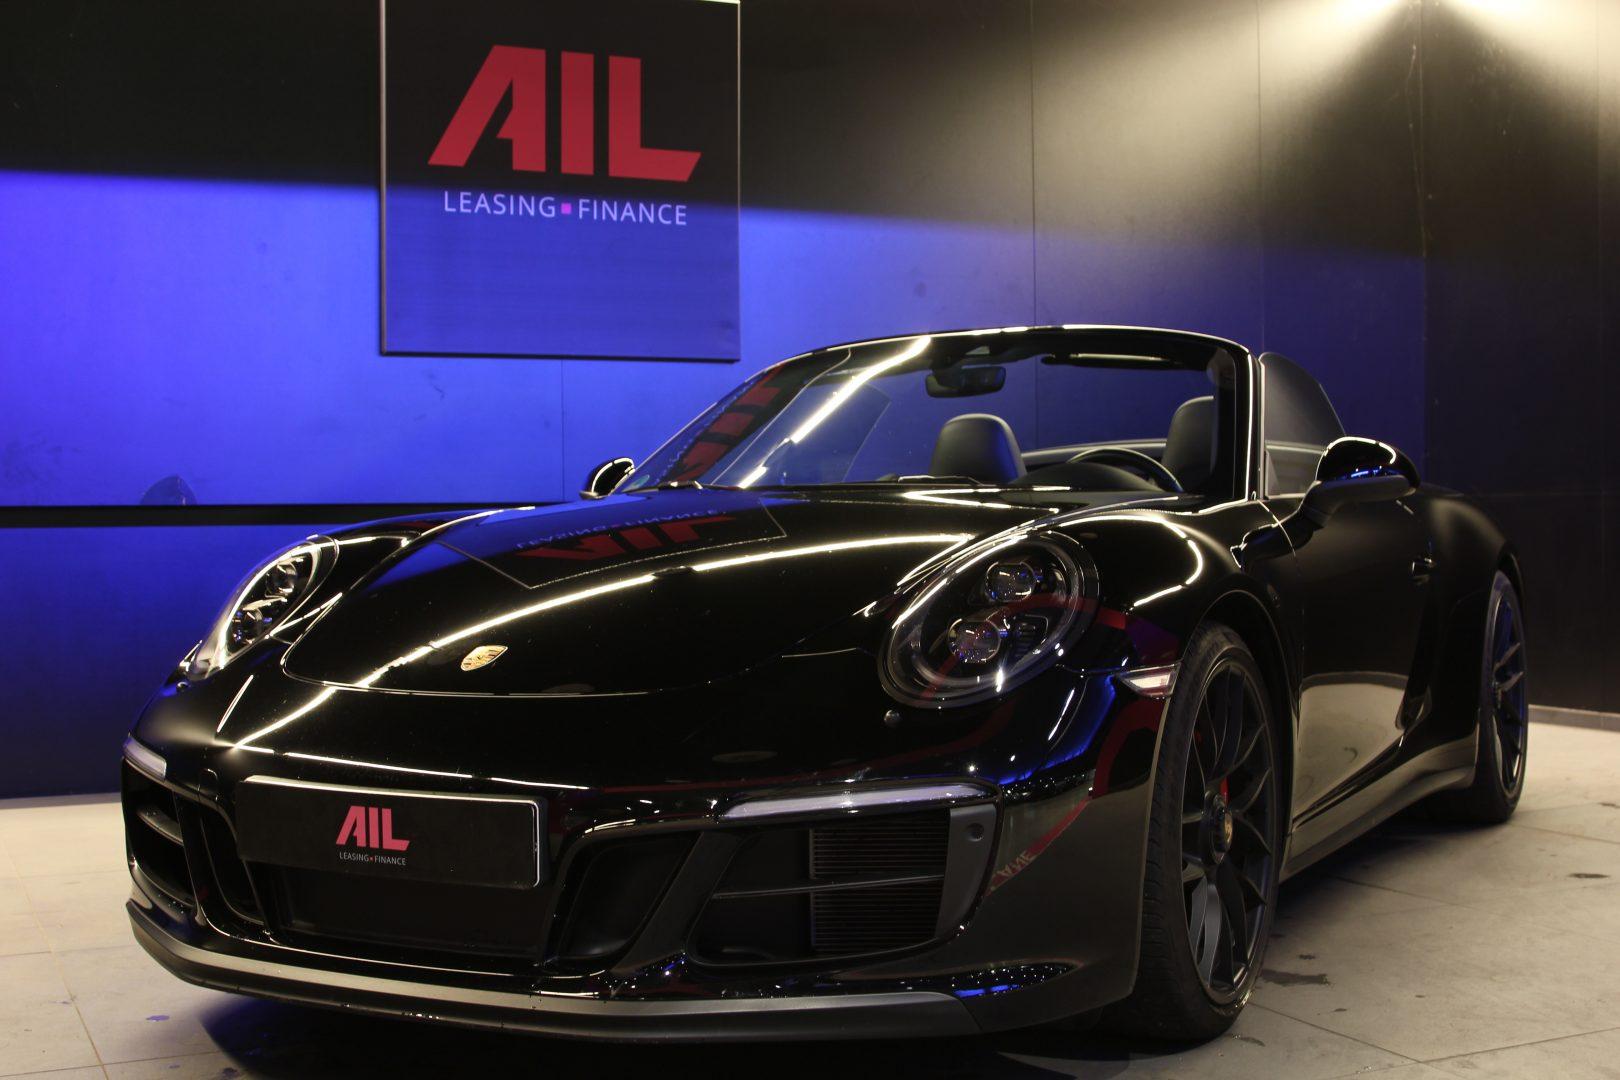 AIL Porsche 991 4 GTS Cabriolet LED Burmester High-End 4